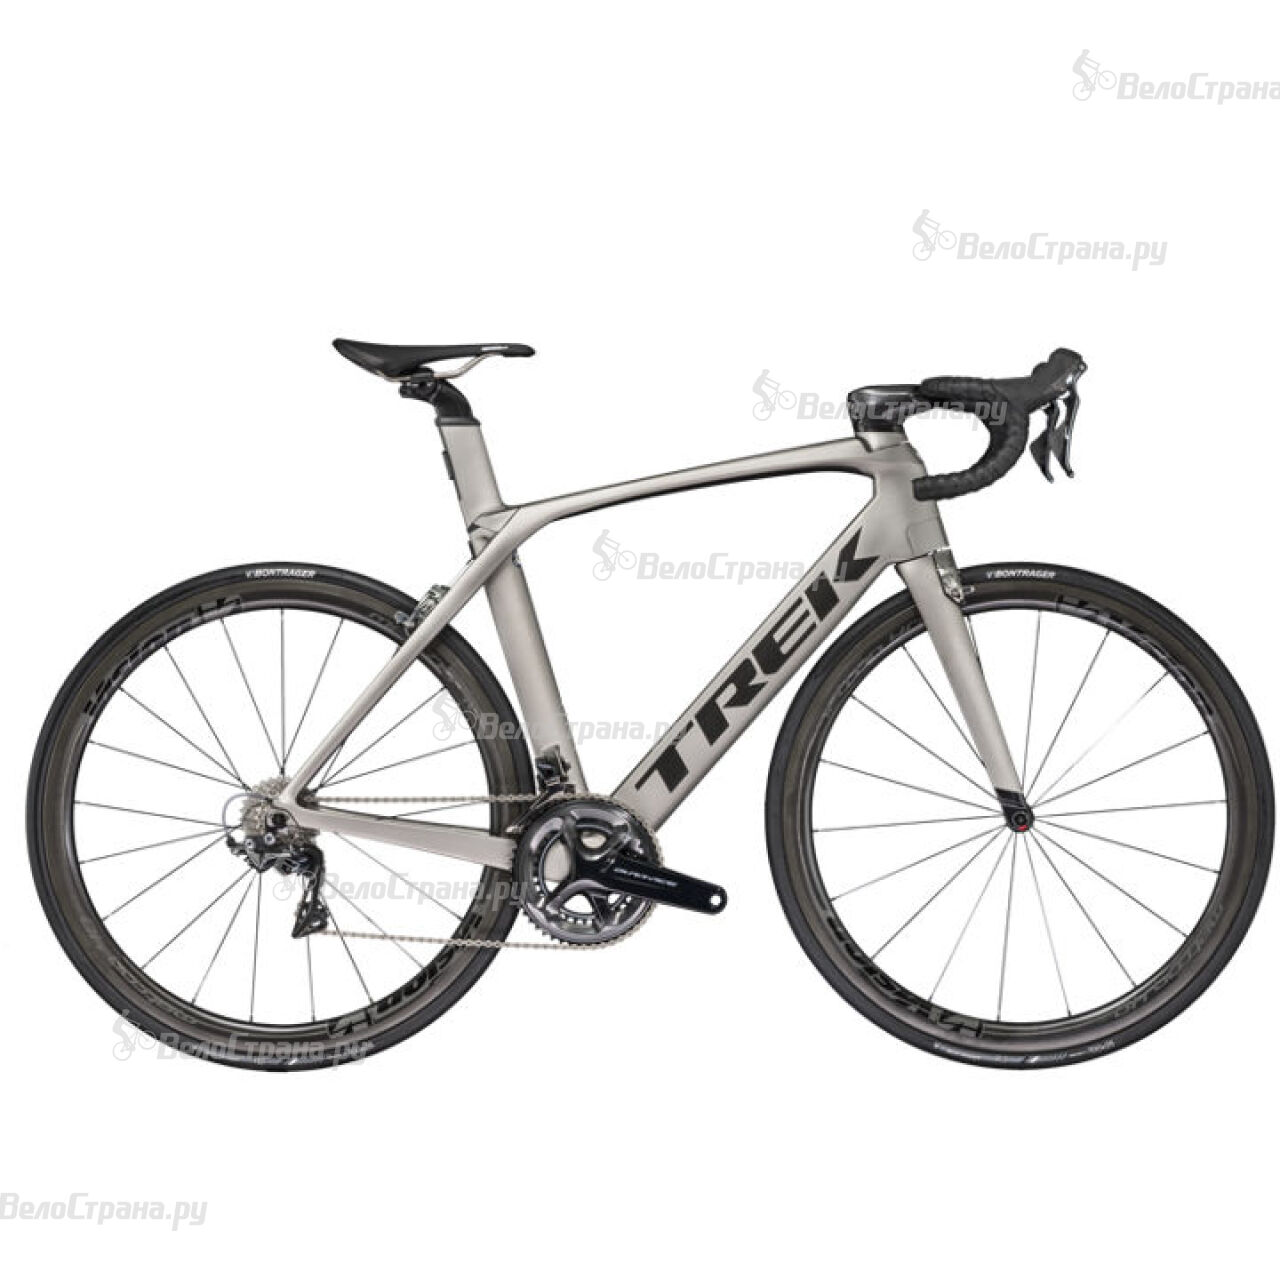 Велосипед Trek MADONE 9.5 C H2 (2017)